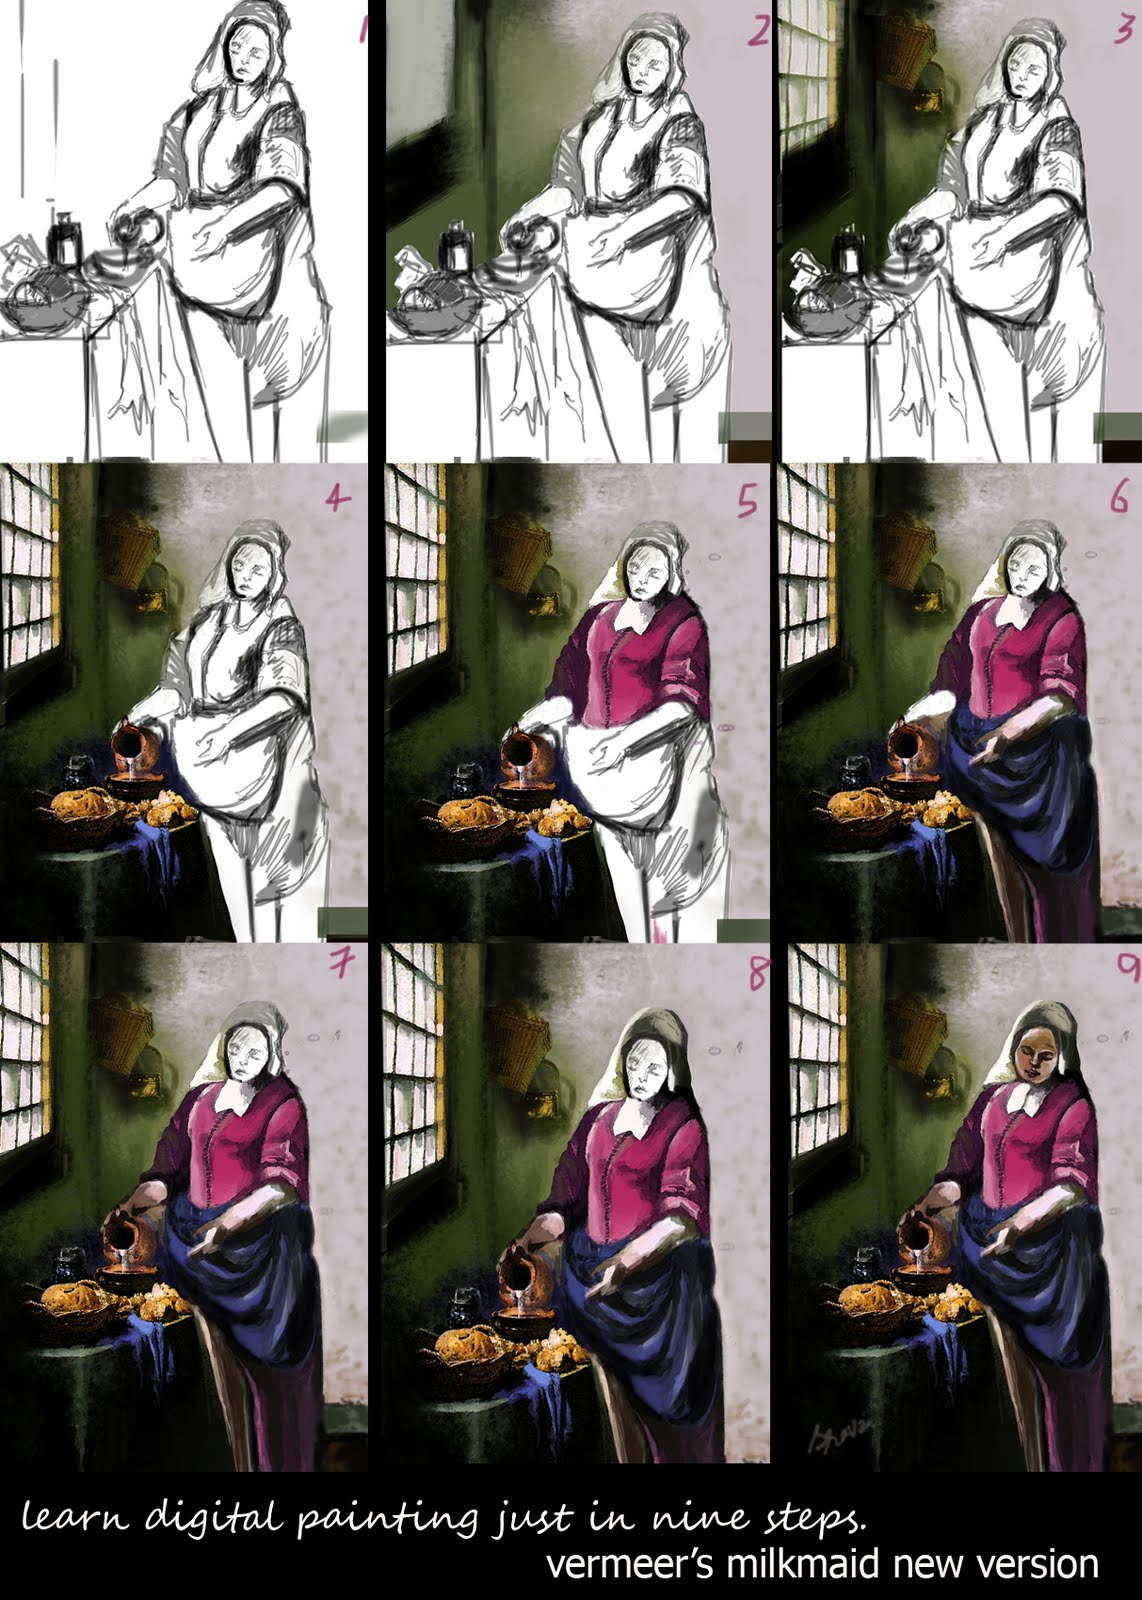 vermeer s milkmaid vs tucker s self portrait Johannes vermeer - the procuress, c 1656 – the figure on the left has been called vermeer's self portrait the procuress by vermeer, is an oil-on-canvas painting that's on display at the gemäldegalerie alte meister in dresden.